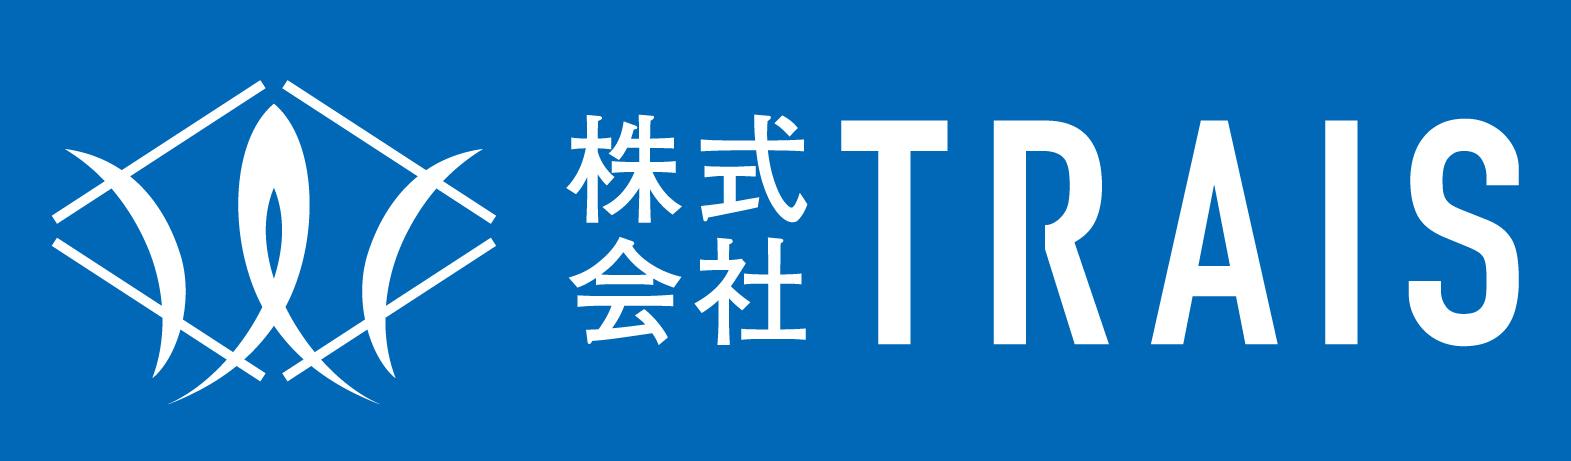 TRAIS,トライス,丸亀,郡家,土木